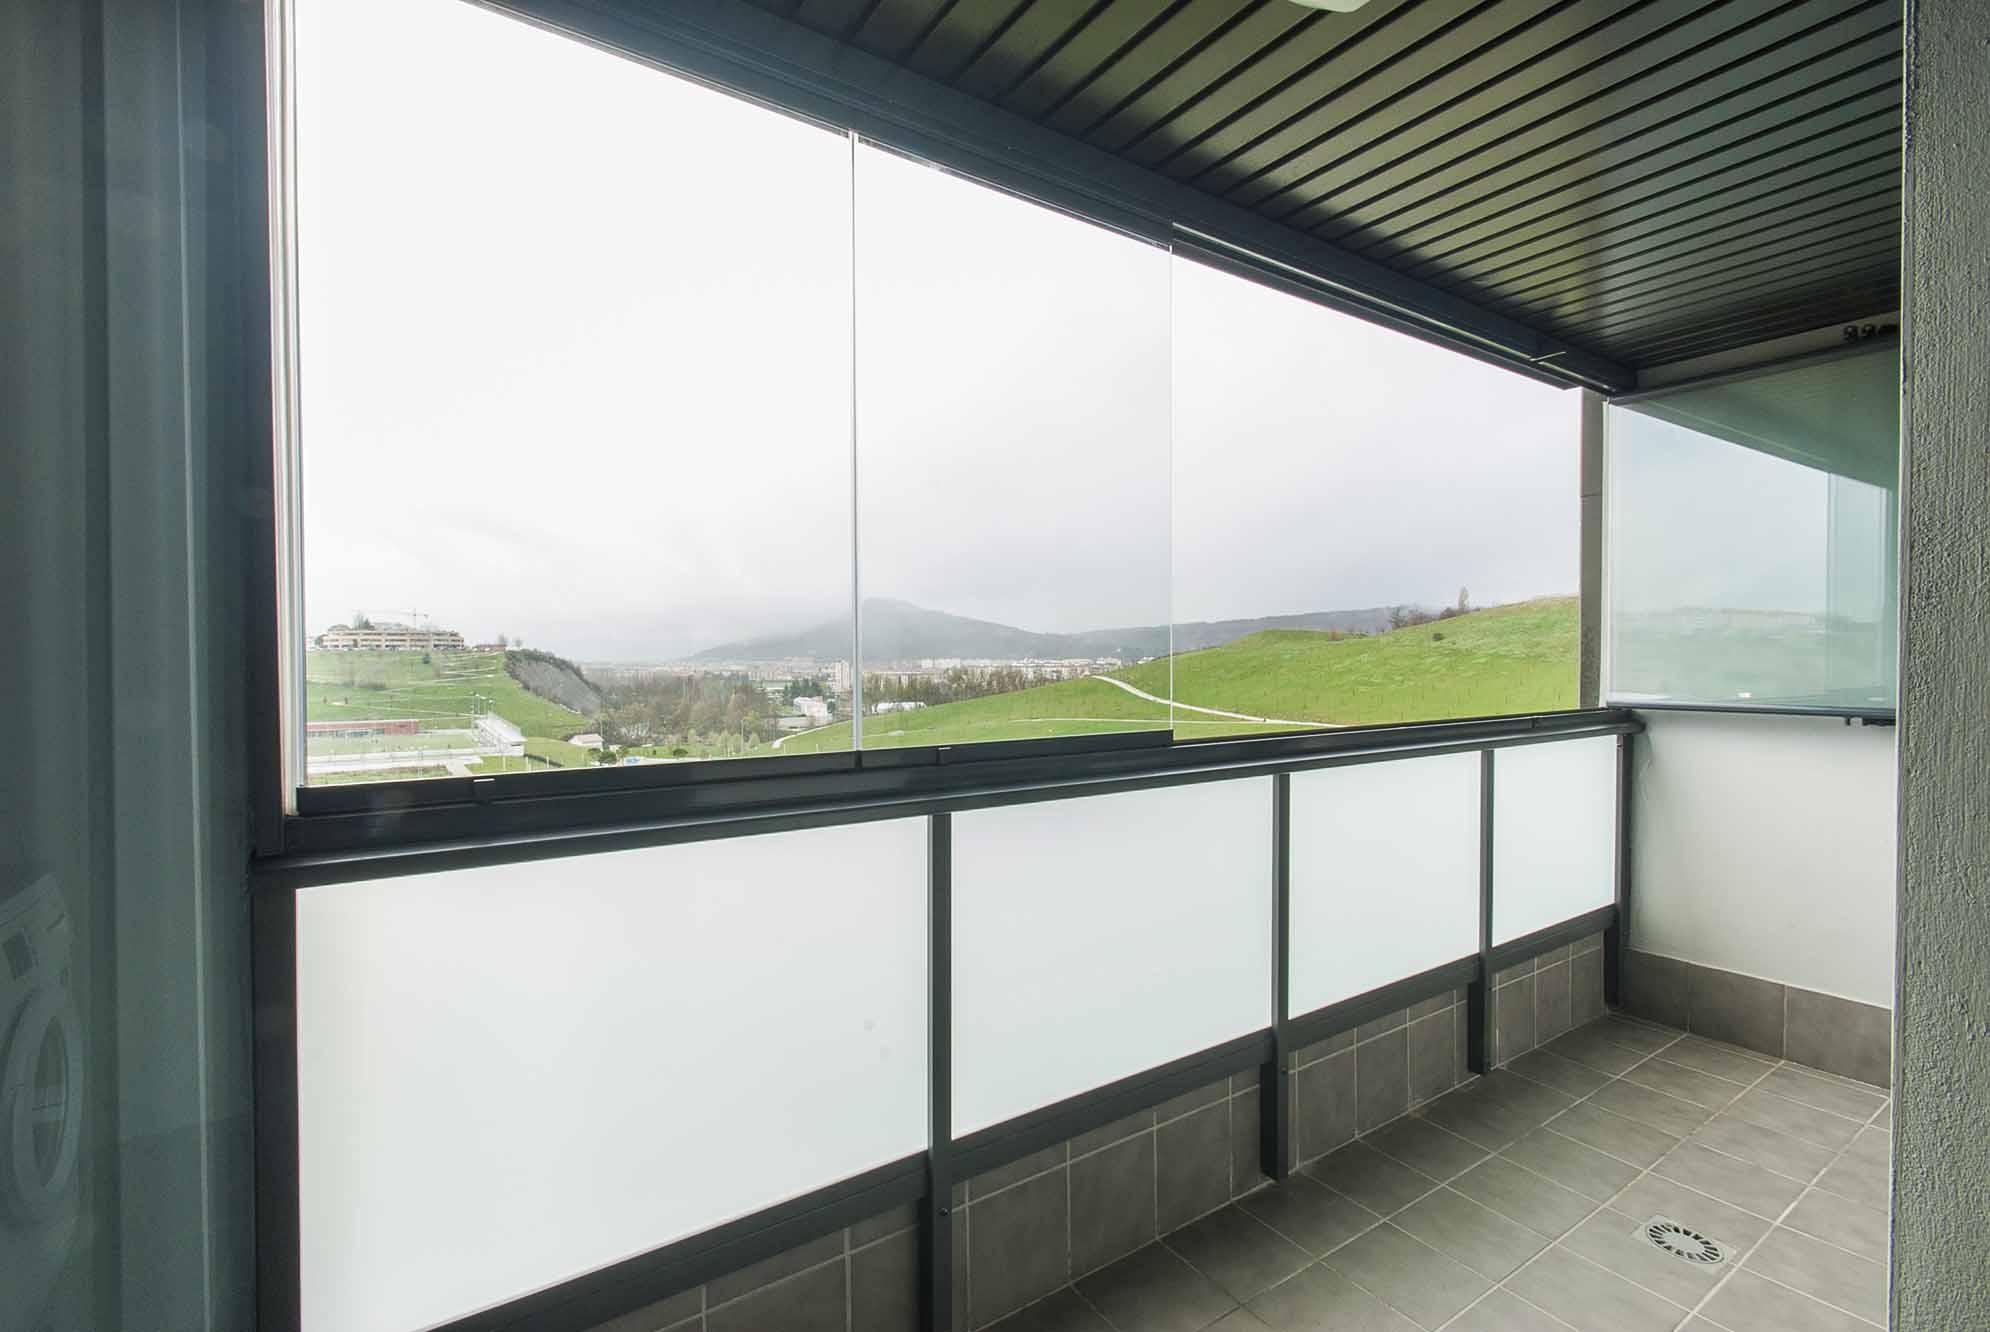 cerramientos-cristal-terrazas-viviendas-navarra-5